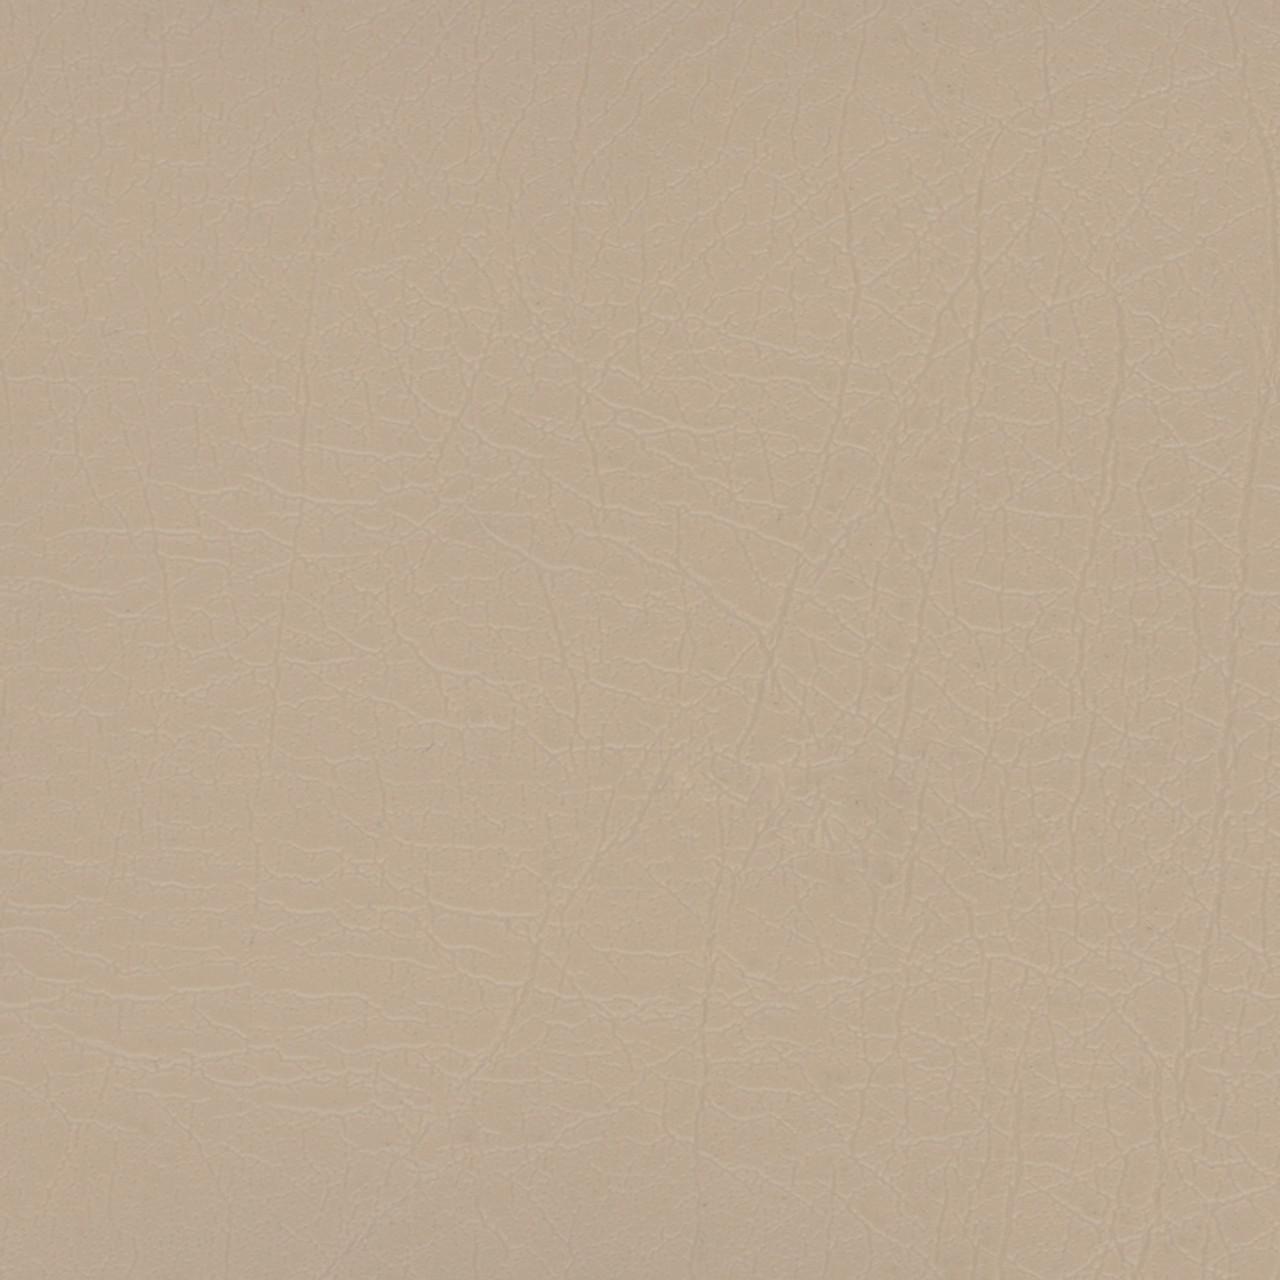 Aries ARI-1604 Sand Dollar